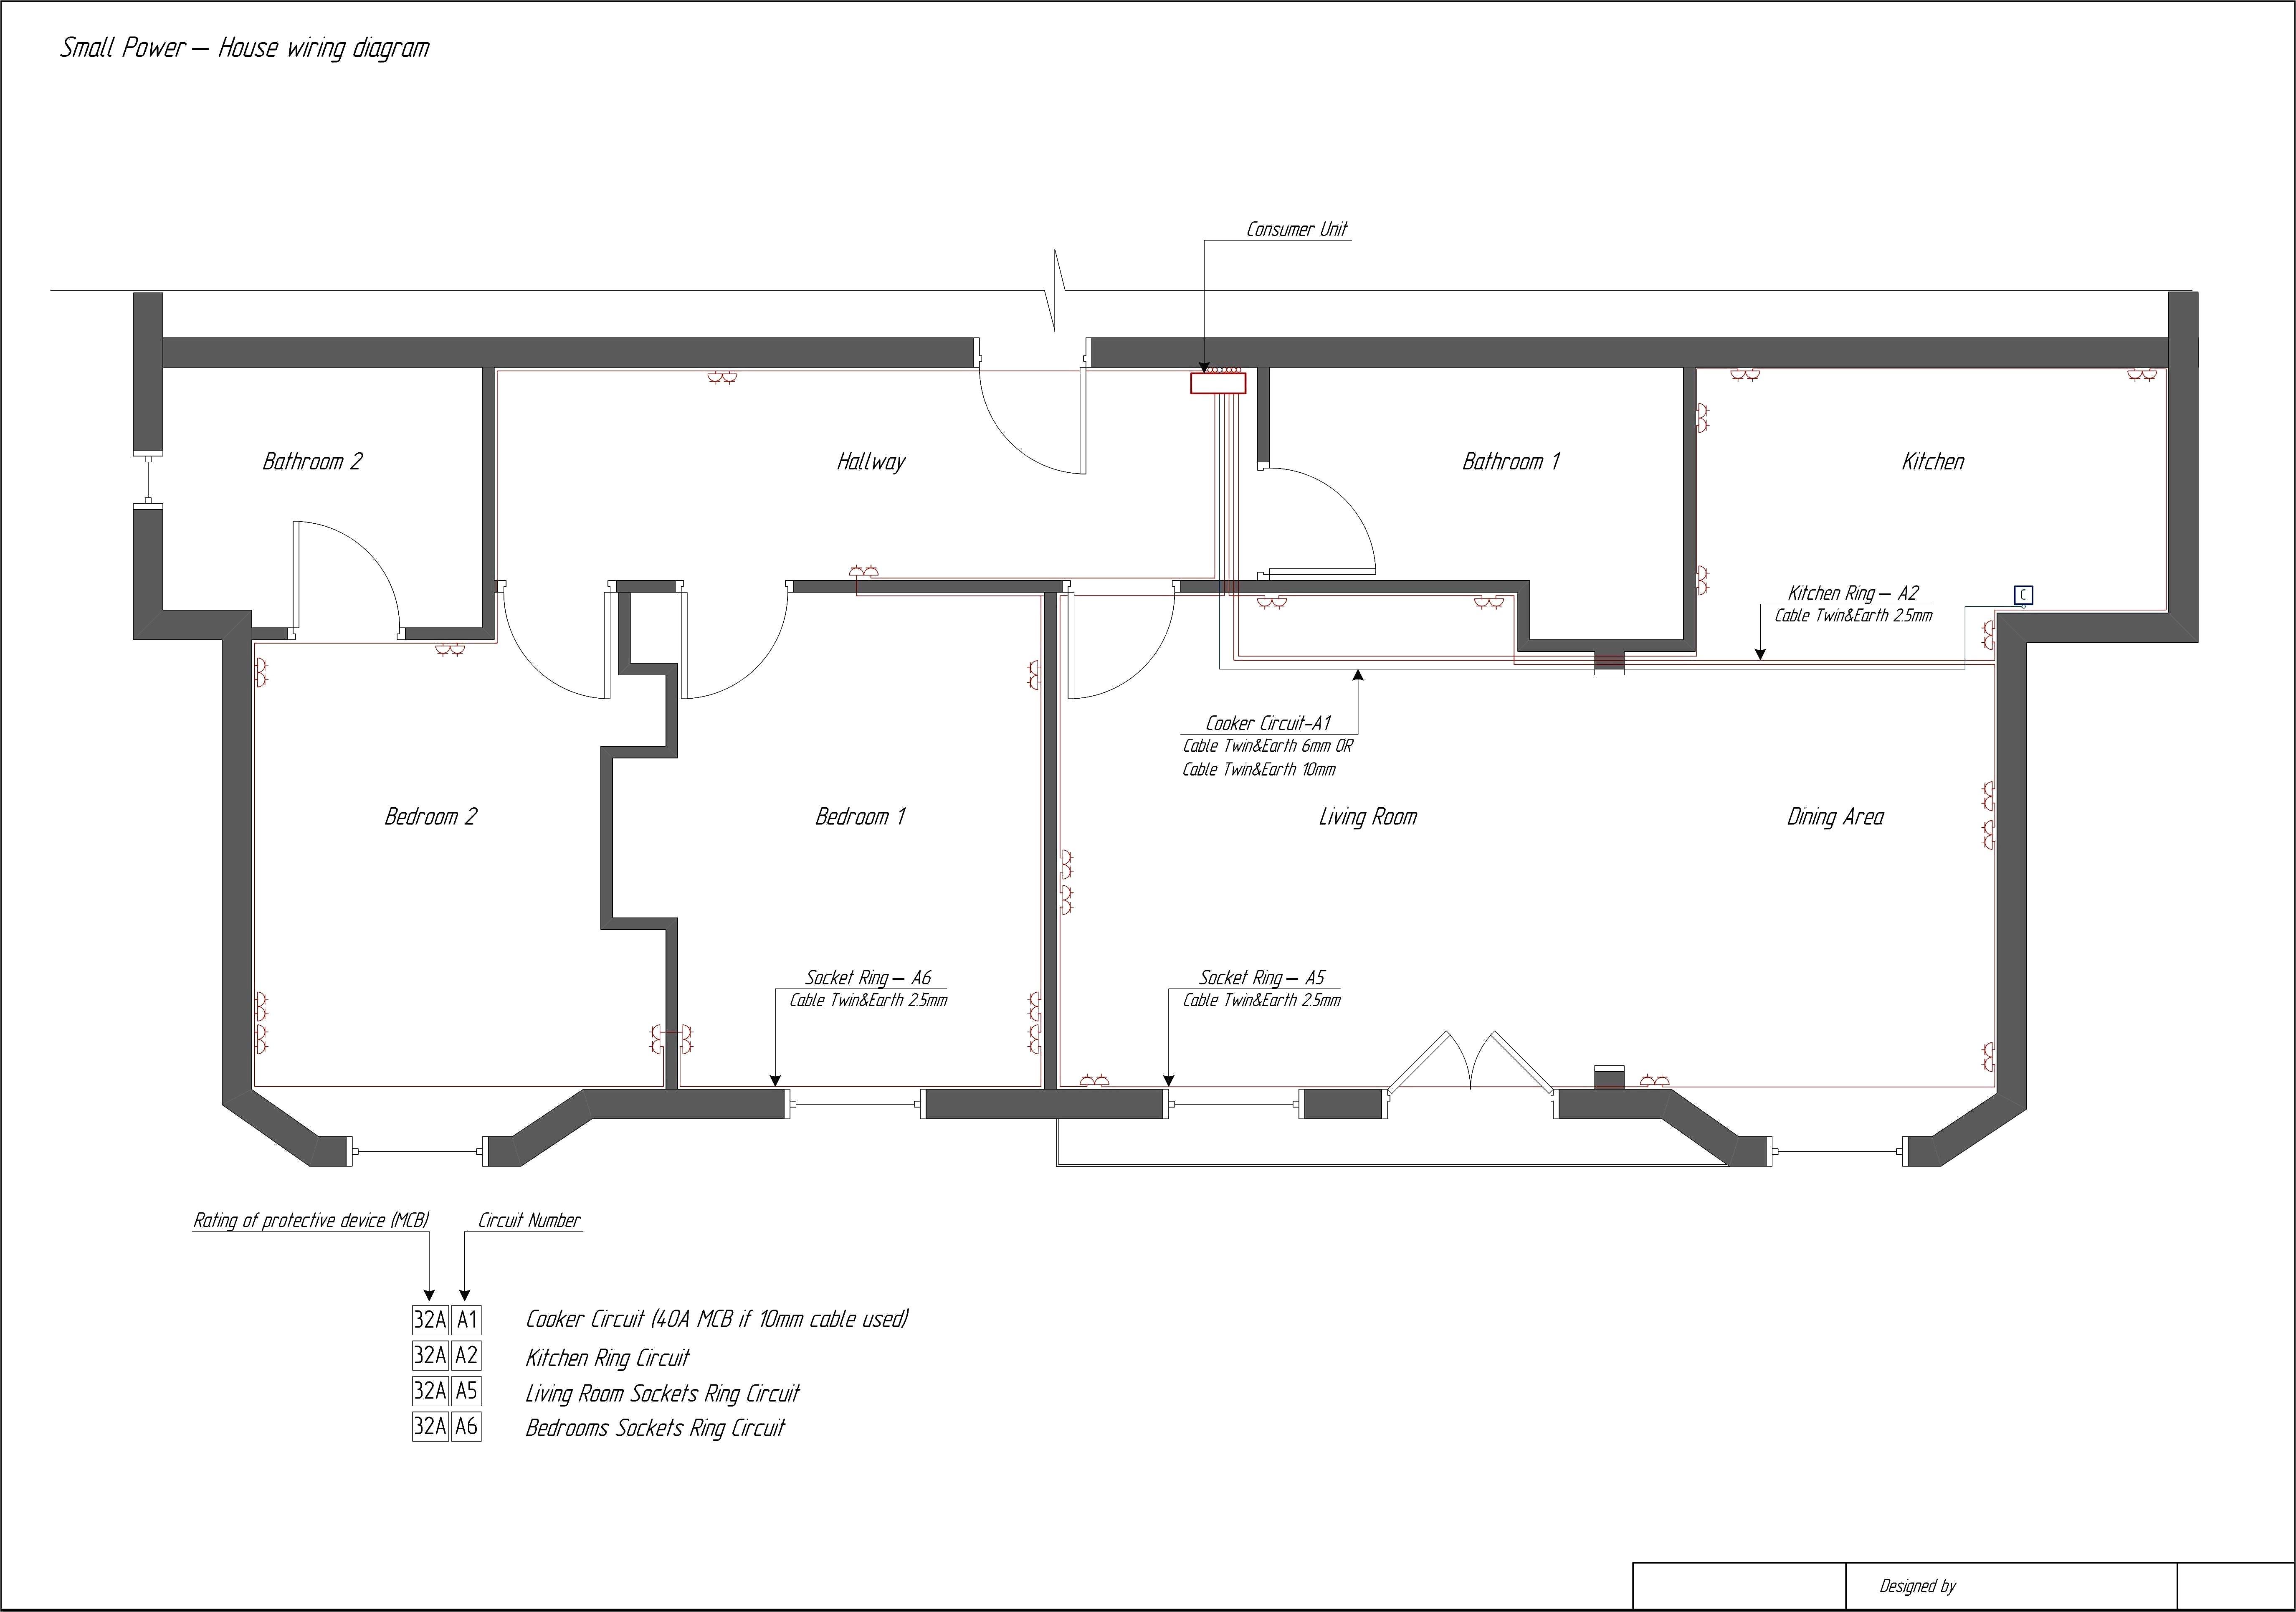 pac sni 15 wiring diagram data schematic diagram amazon com pac sni15 line output converter for